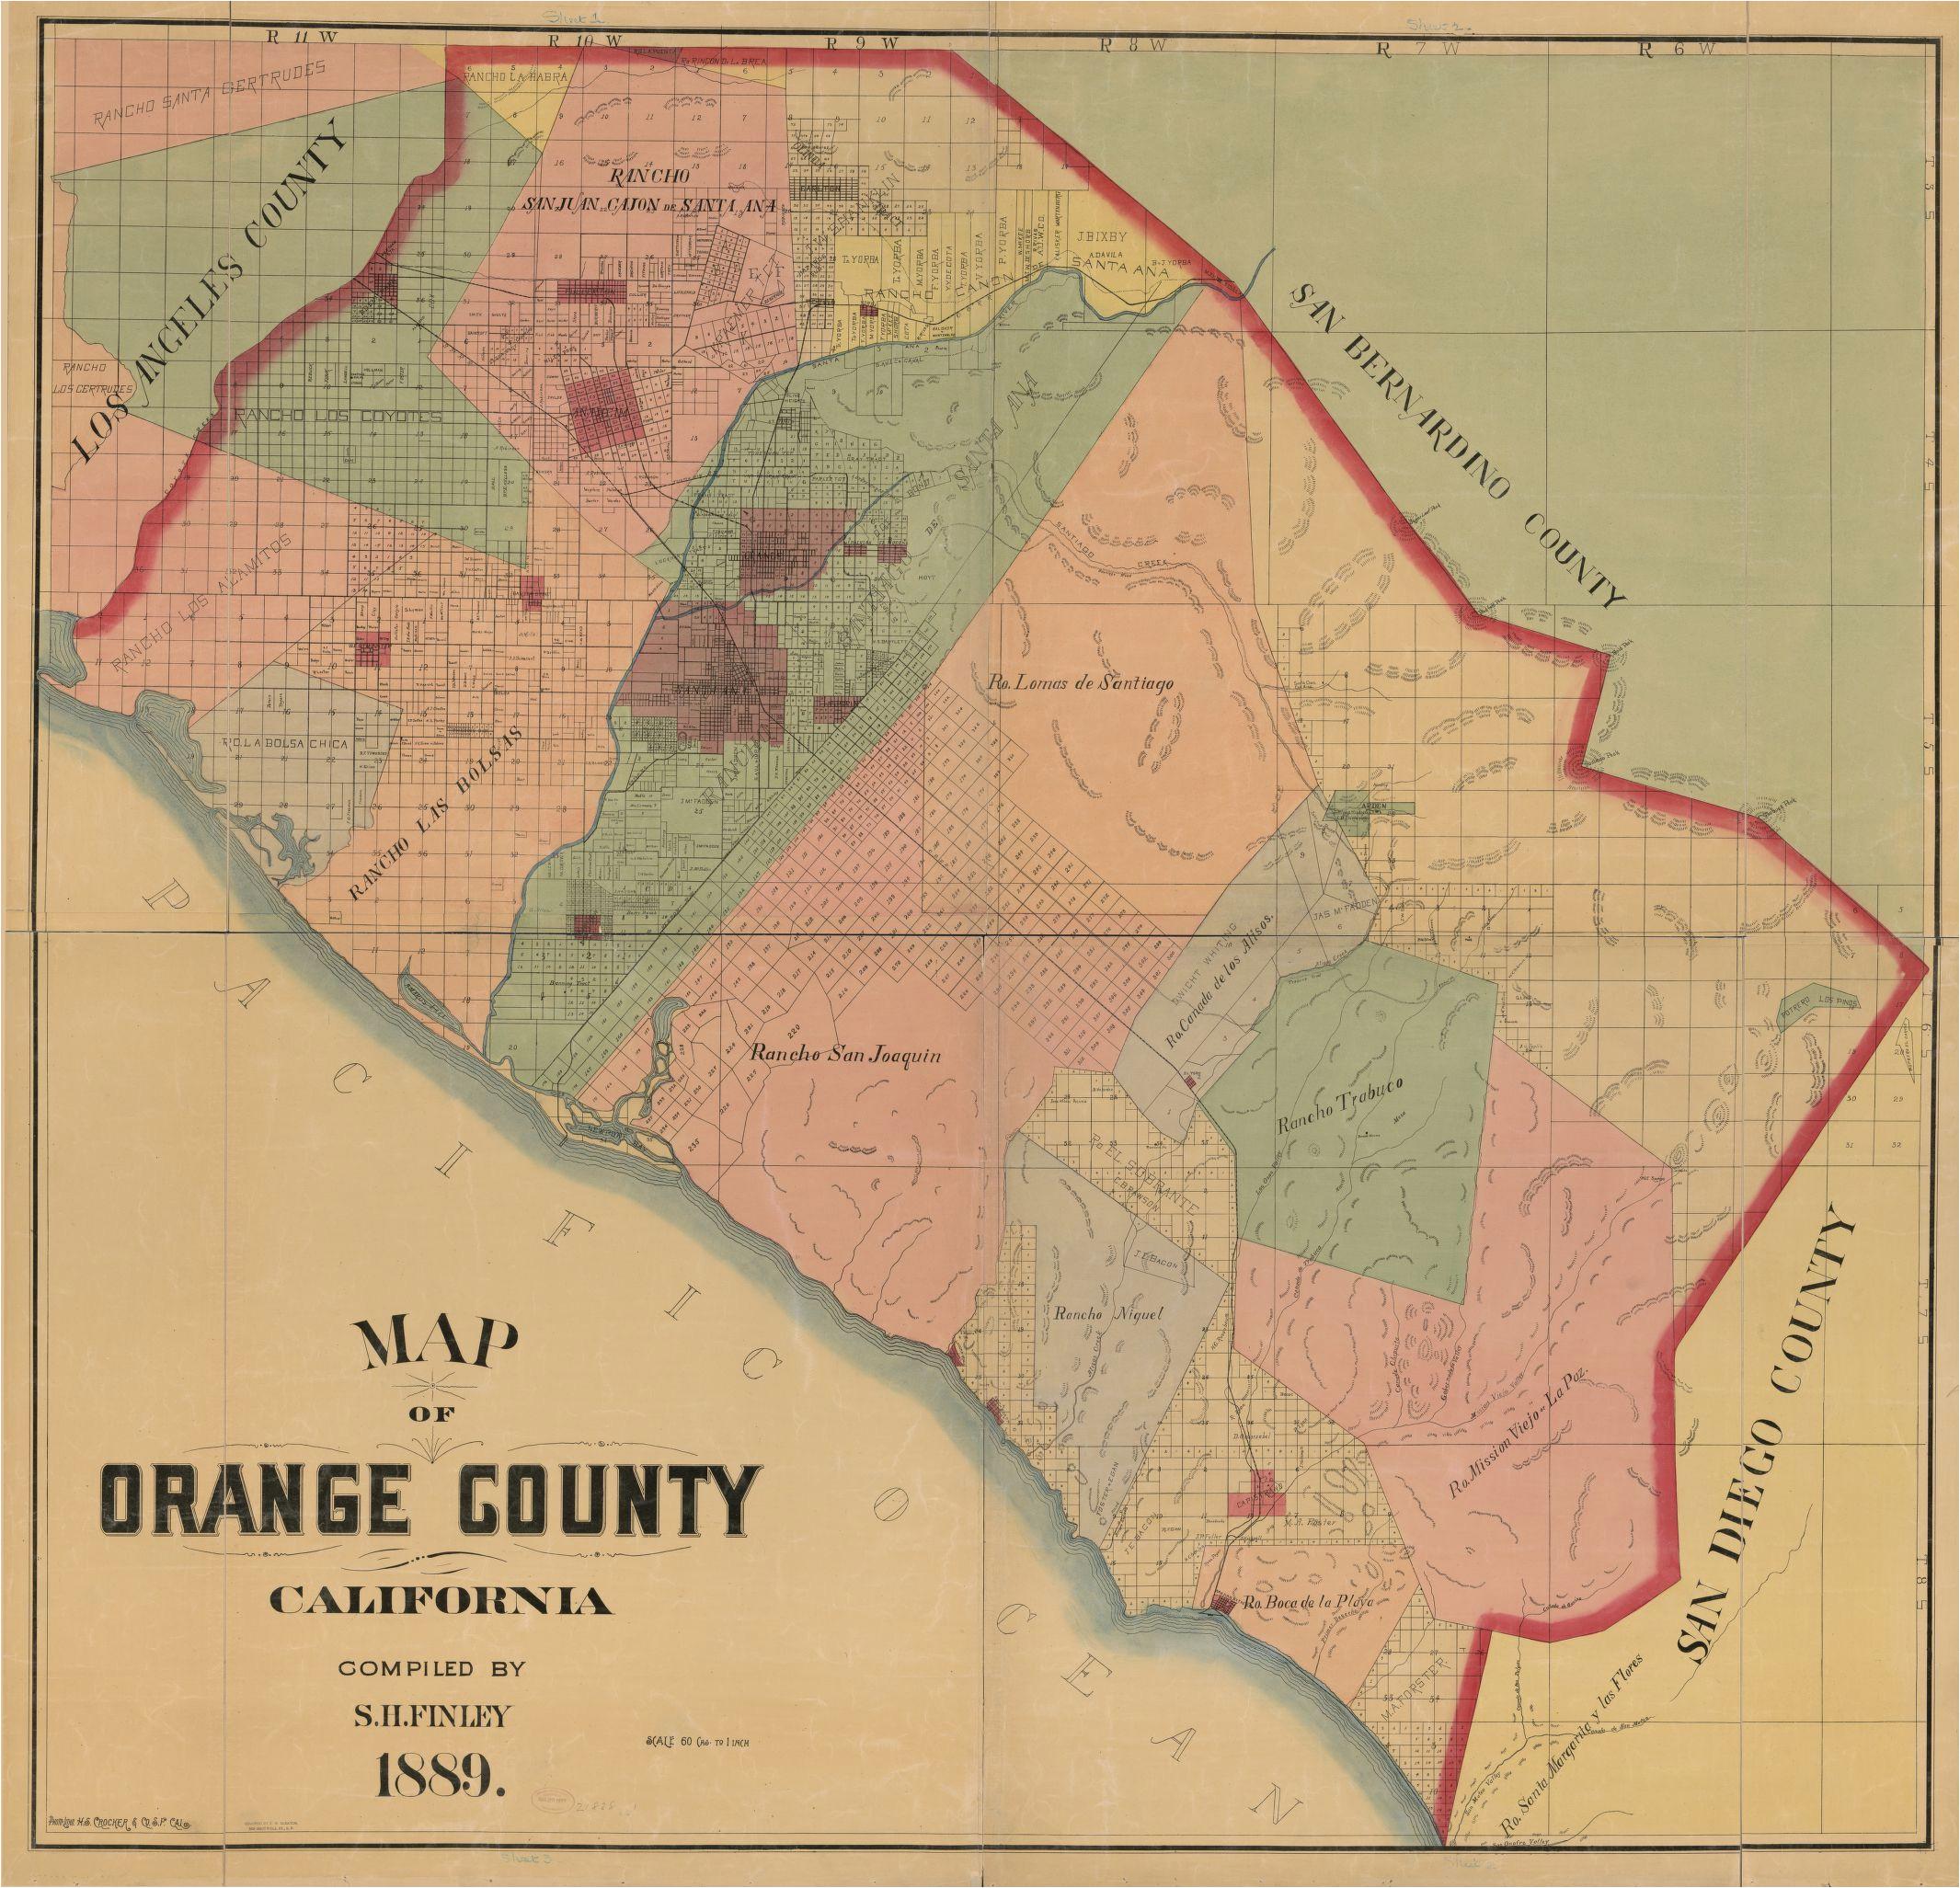 pin by yasminpari on old orange county pinterest orange county